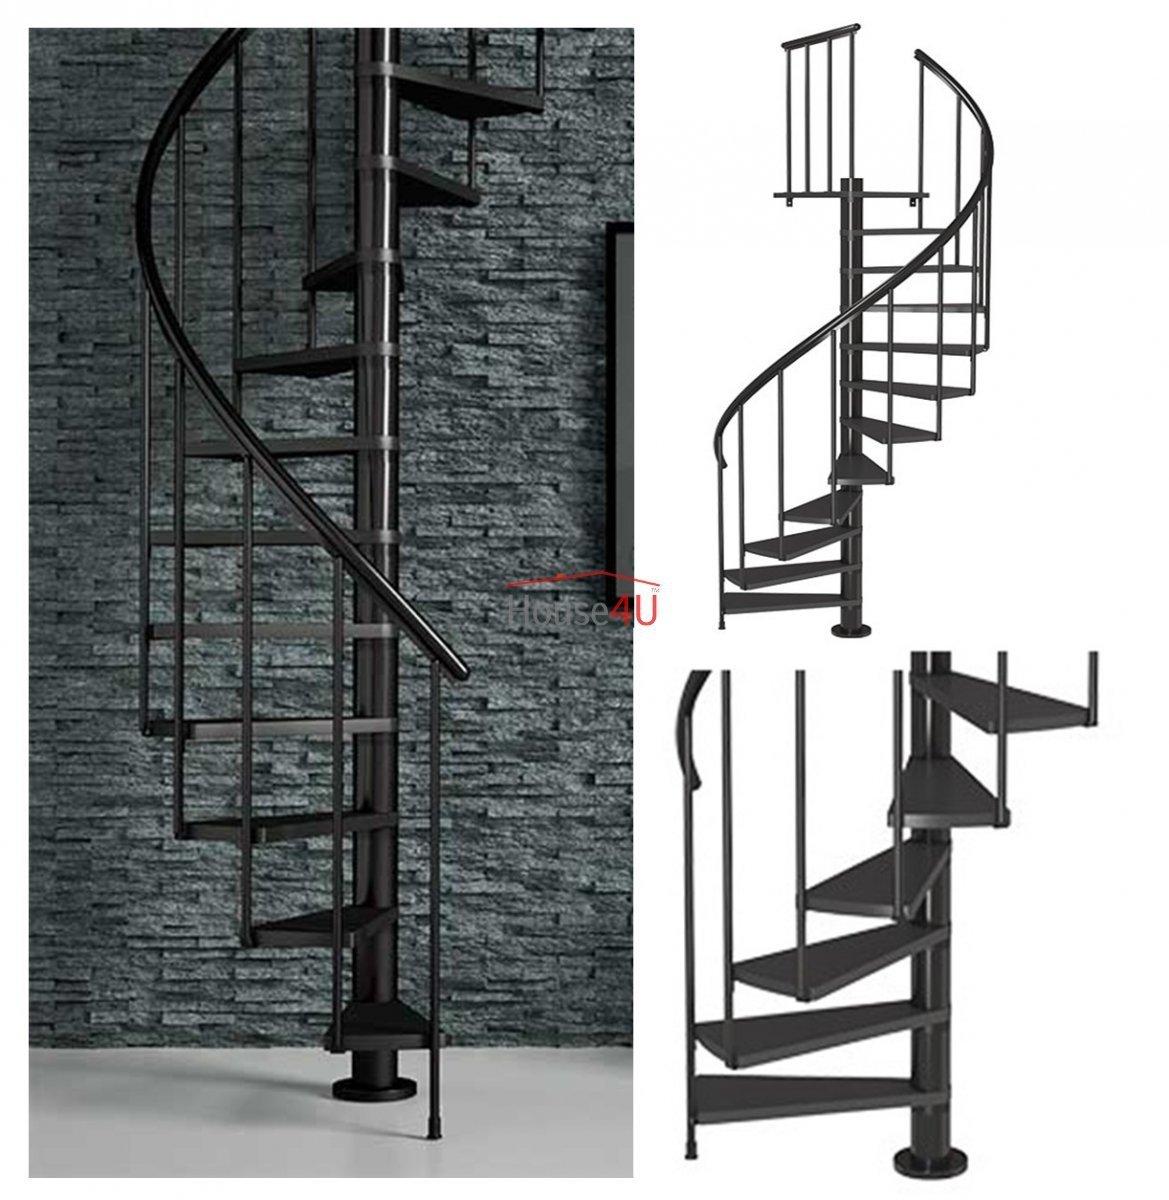 Treppenschutzgitter Spindeltreppe